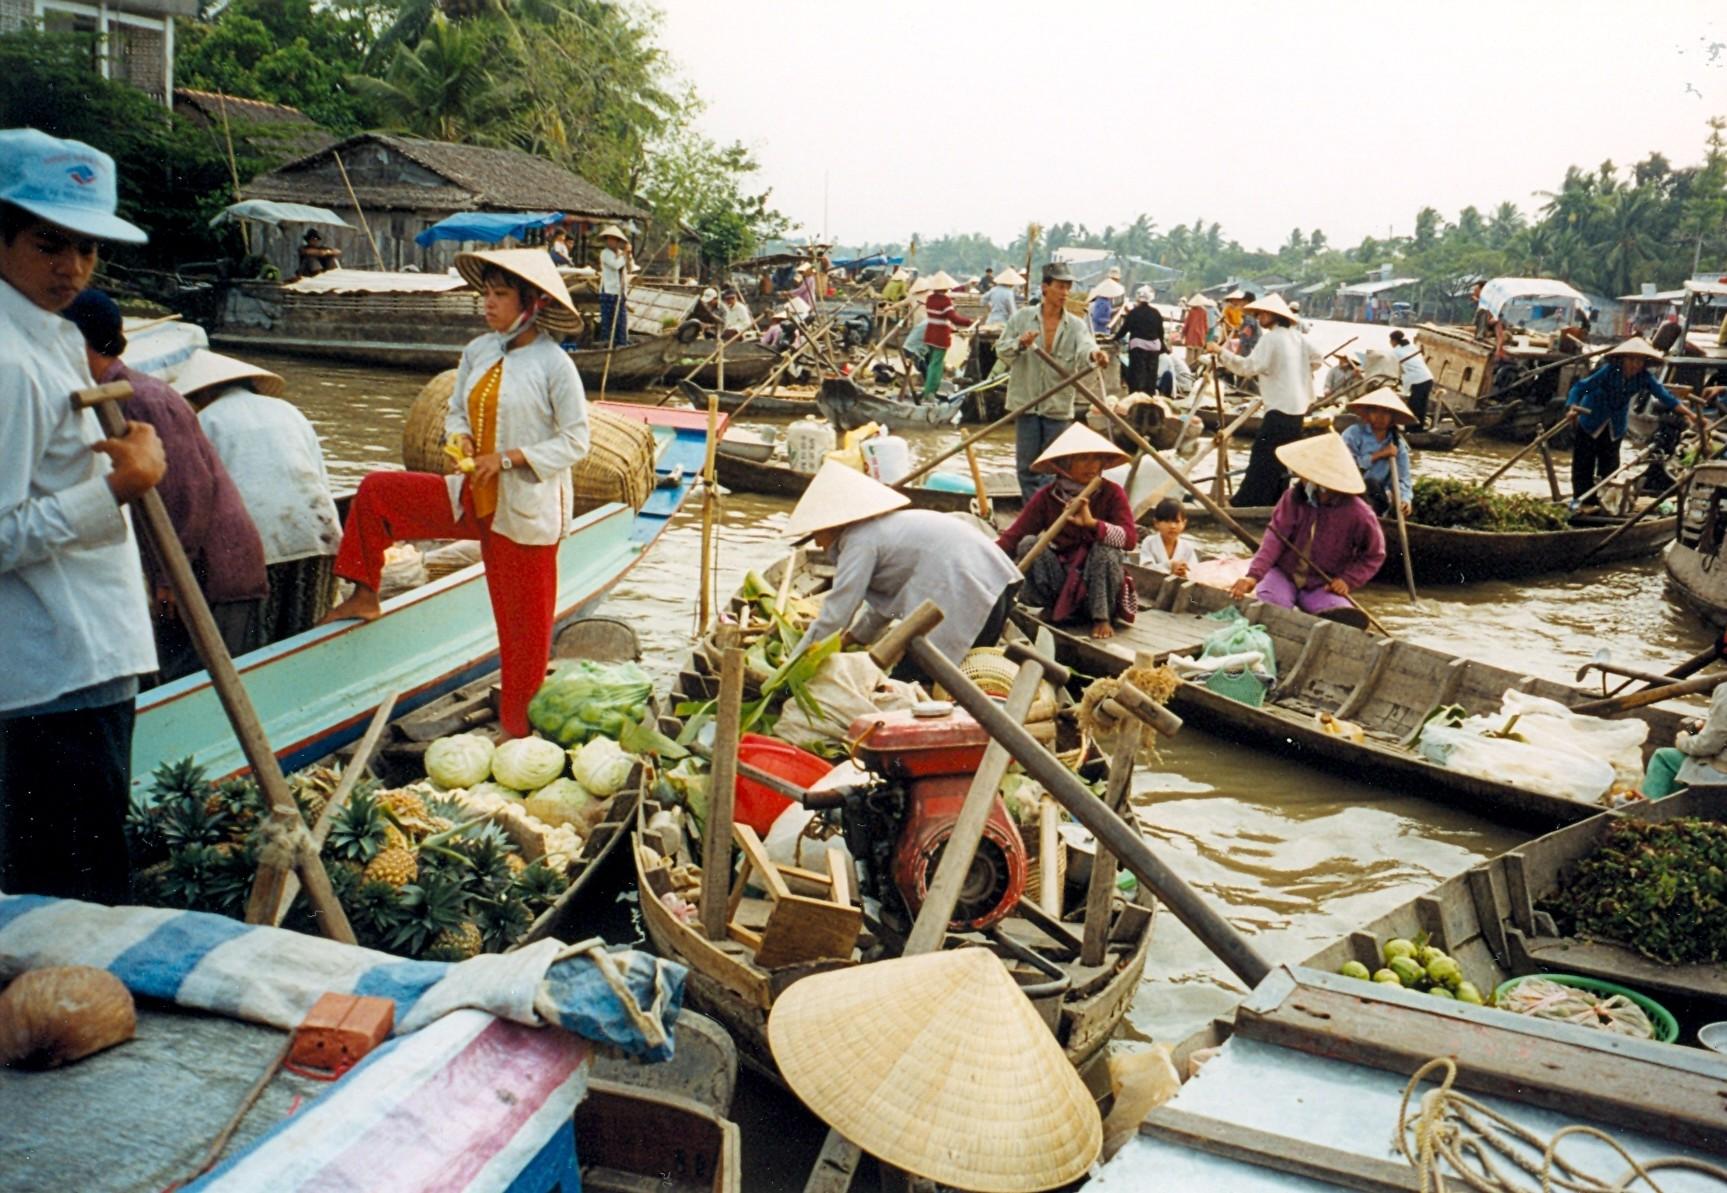 Vietnam Shopping-Cai Rang Market